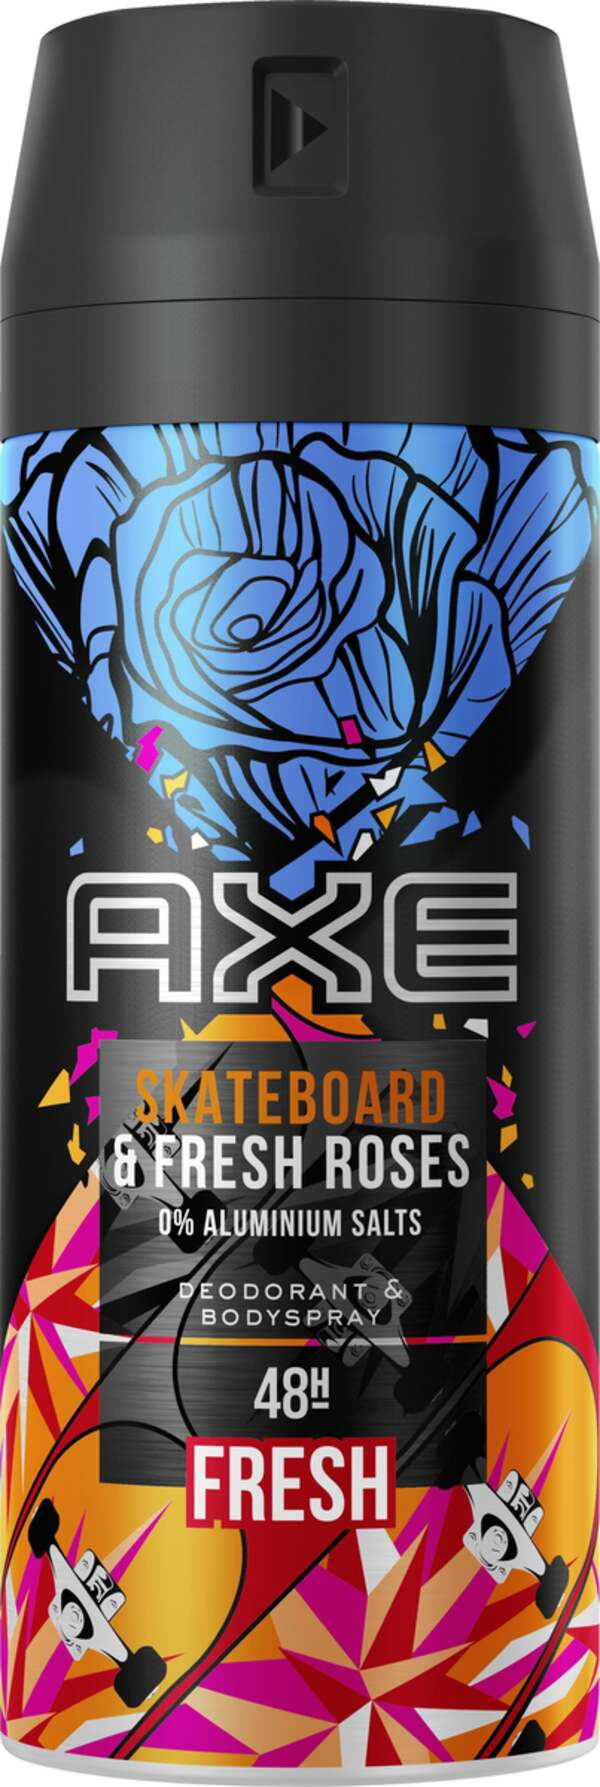 AXE Deodorant & Bodyspray Skateboard & Fresh Roses